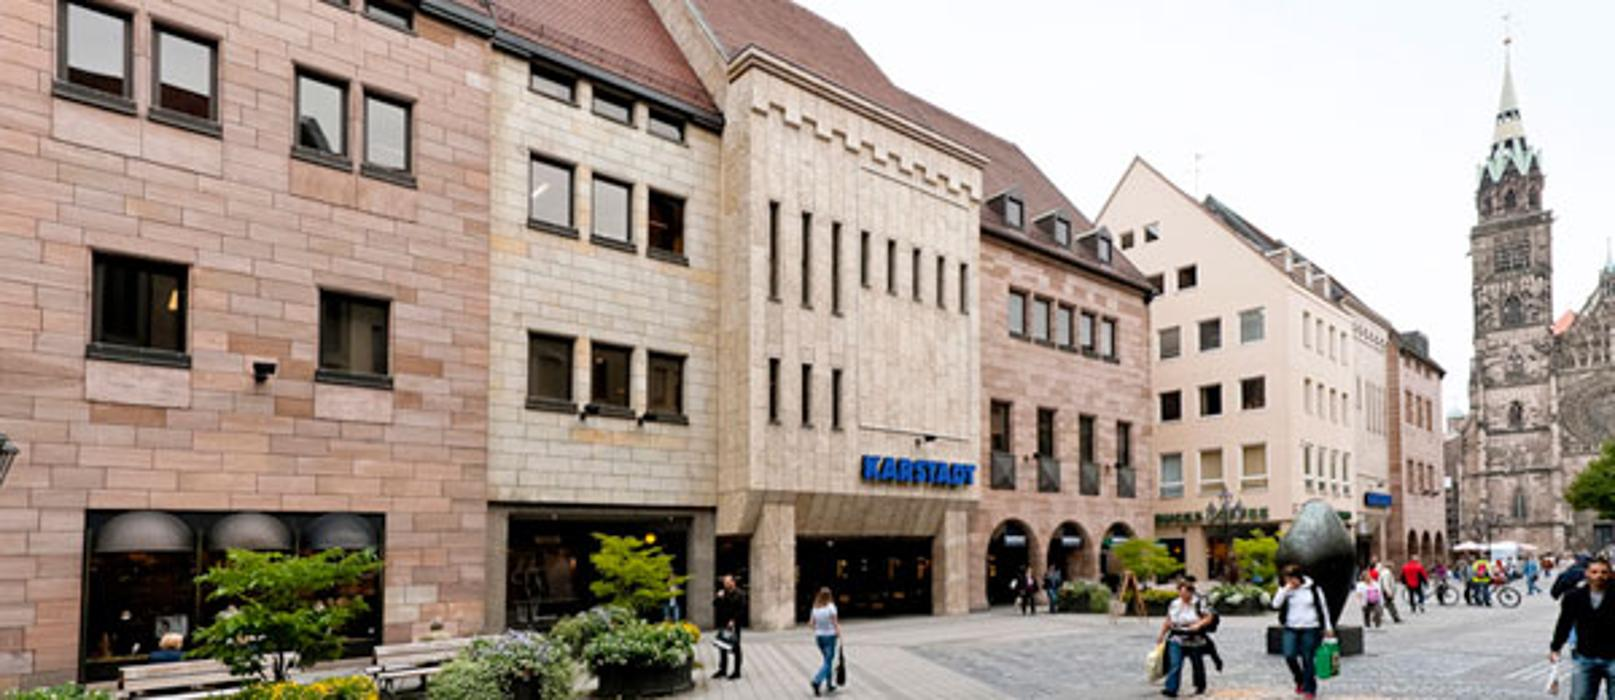 GALERIA (Karstadt) Nürnberg An der Lorenzkirche, Königstraße in Nürnberg